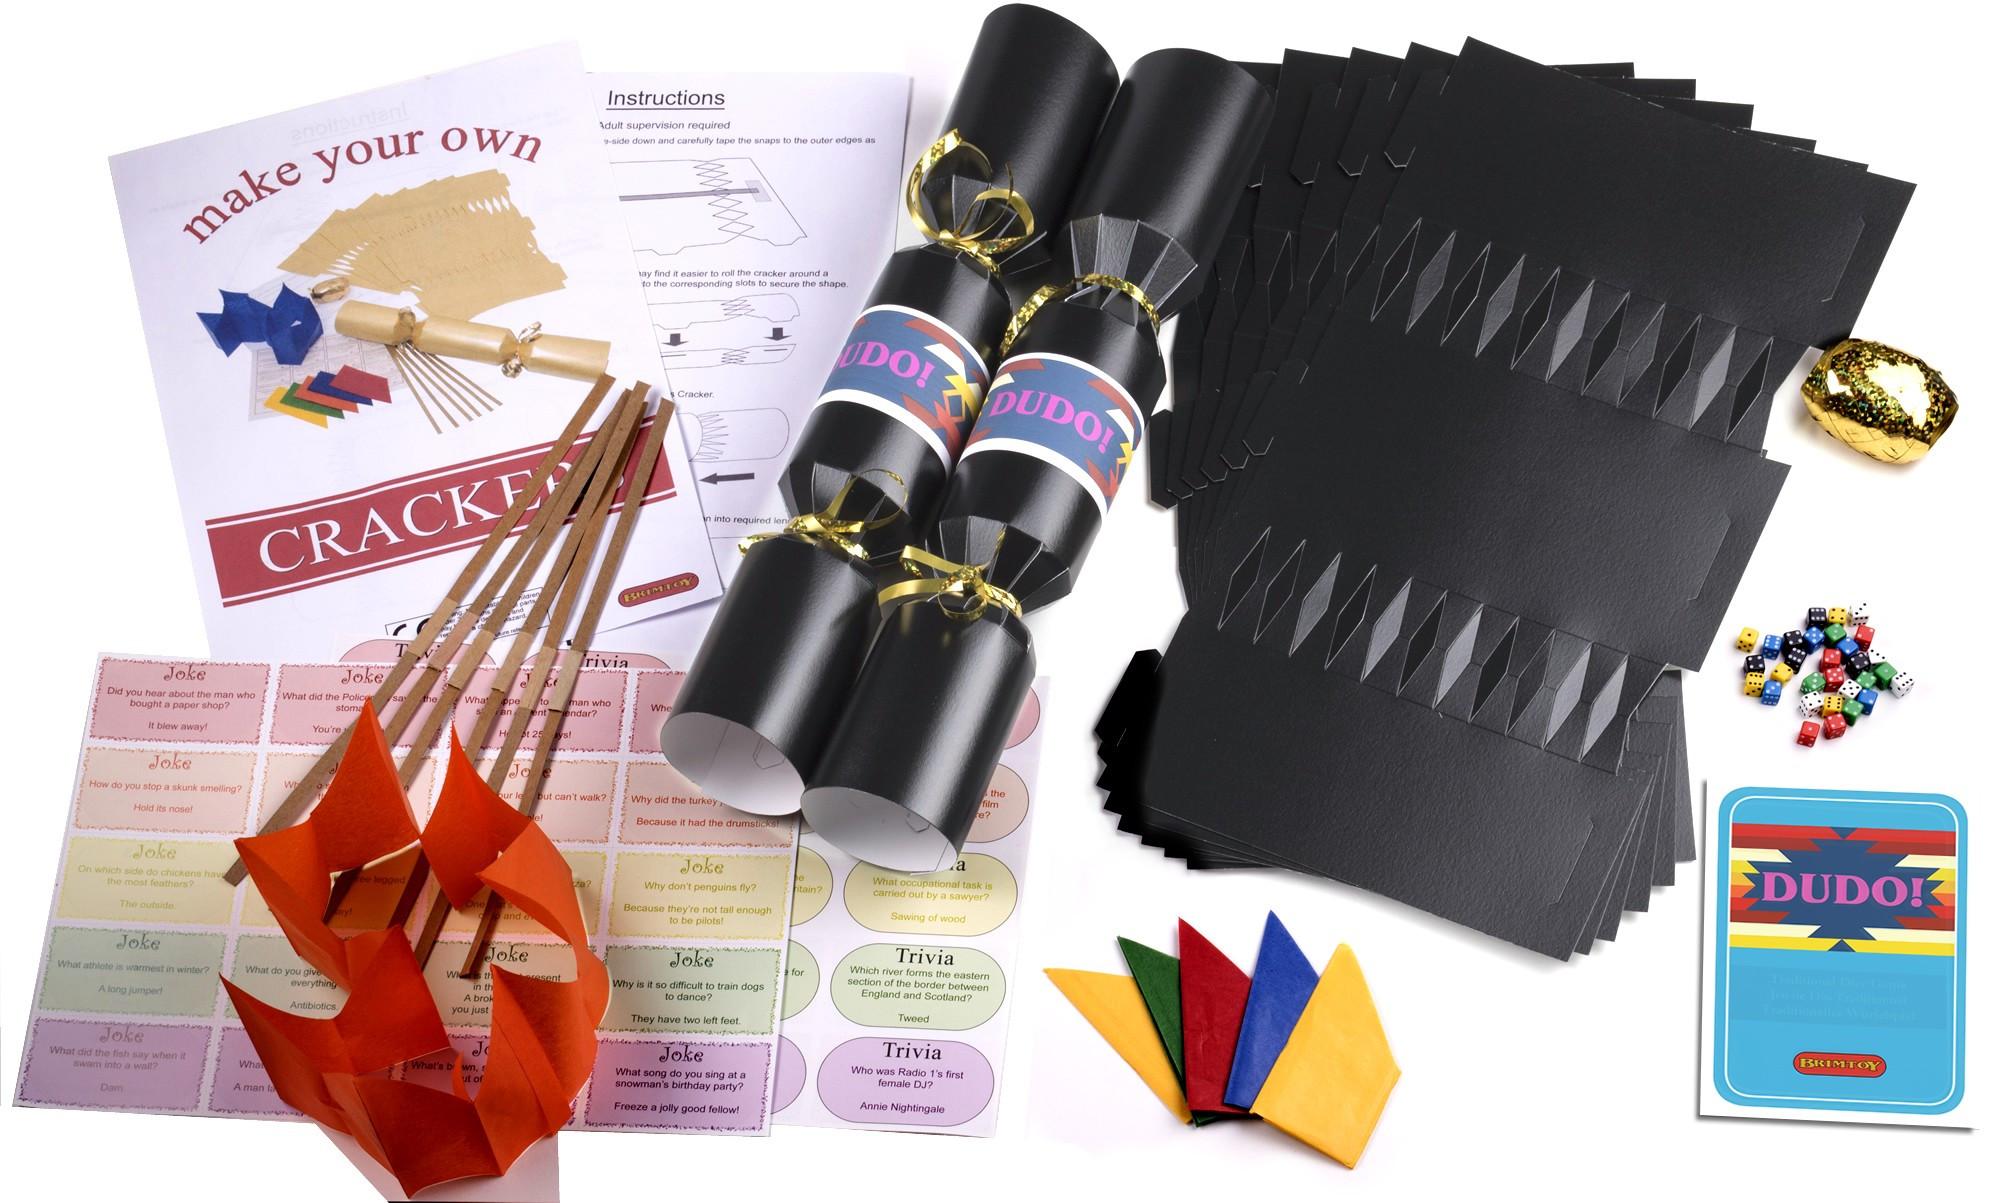 Dudo Cracket Kits